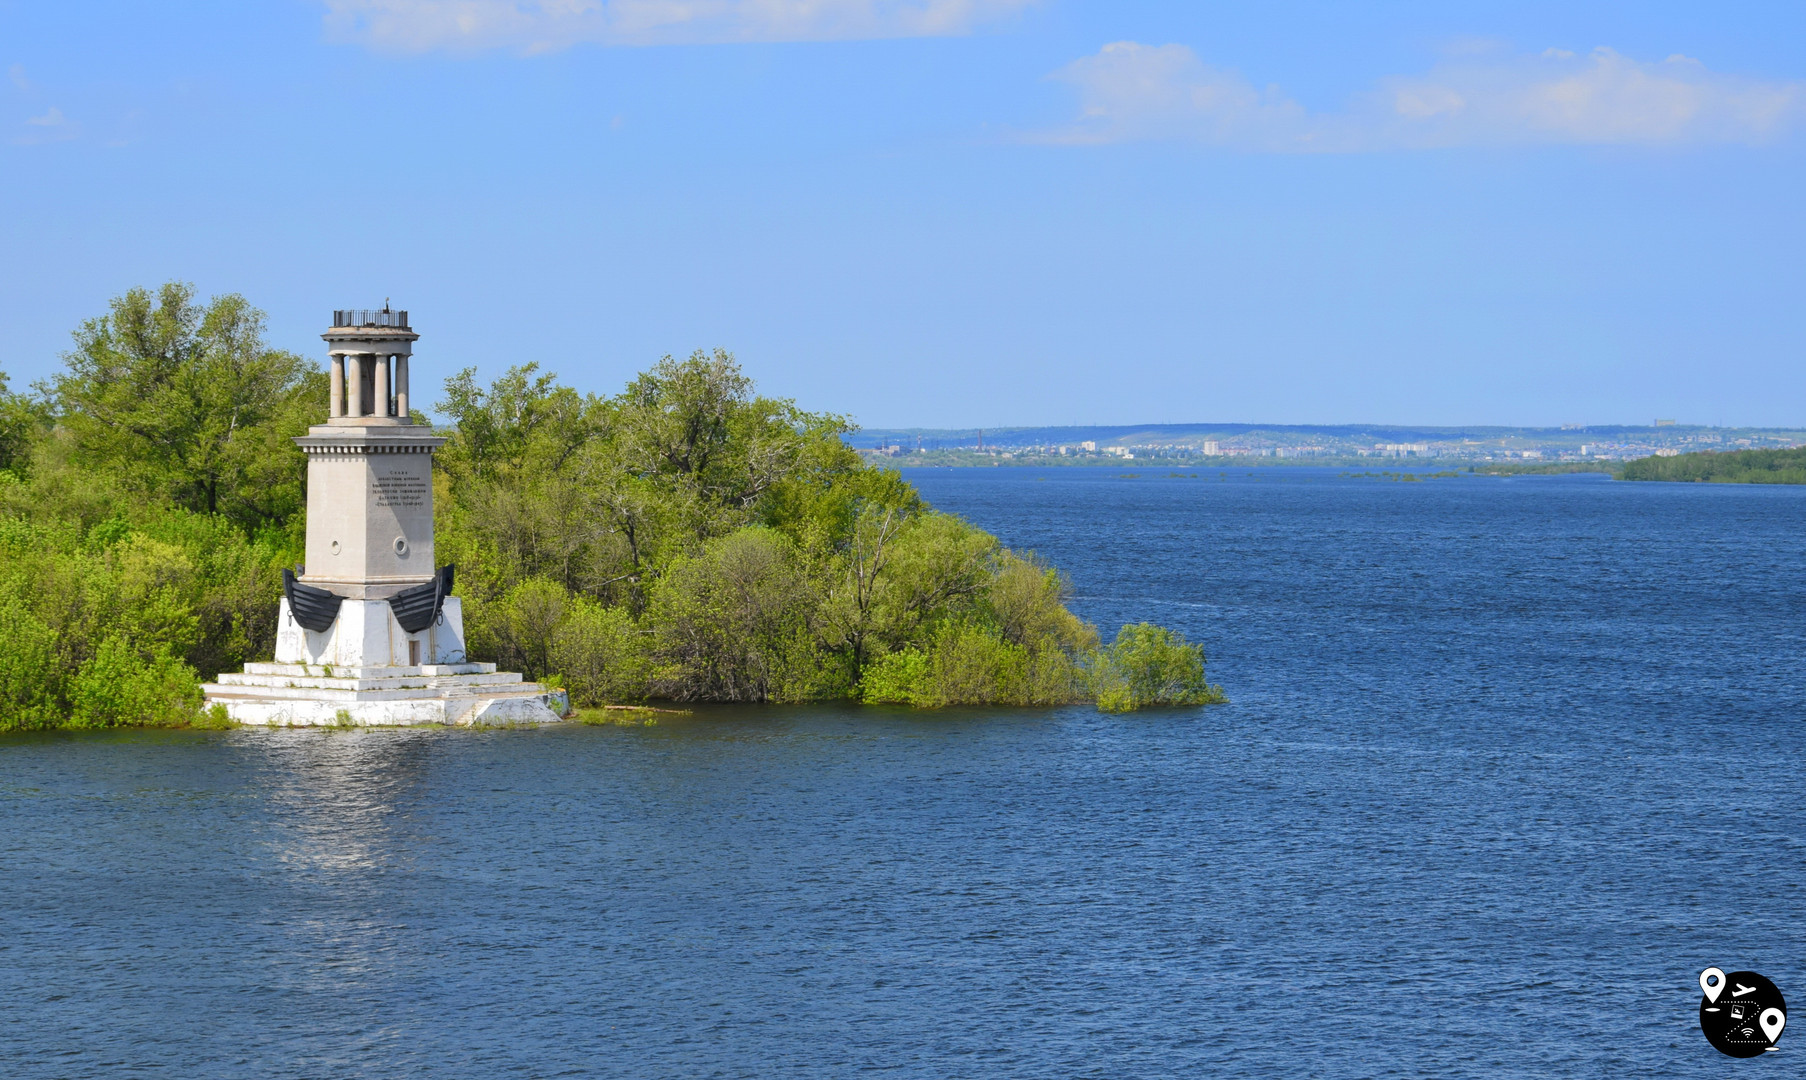 Начало Волго-Донского канала, Волгоград